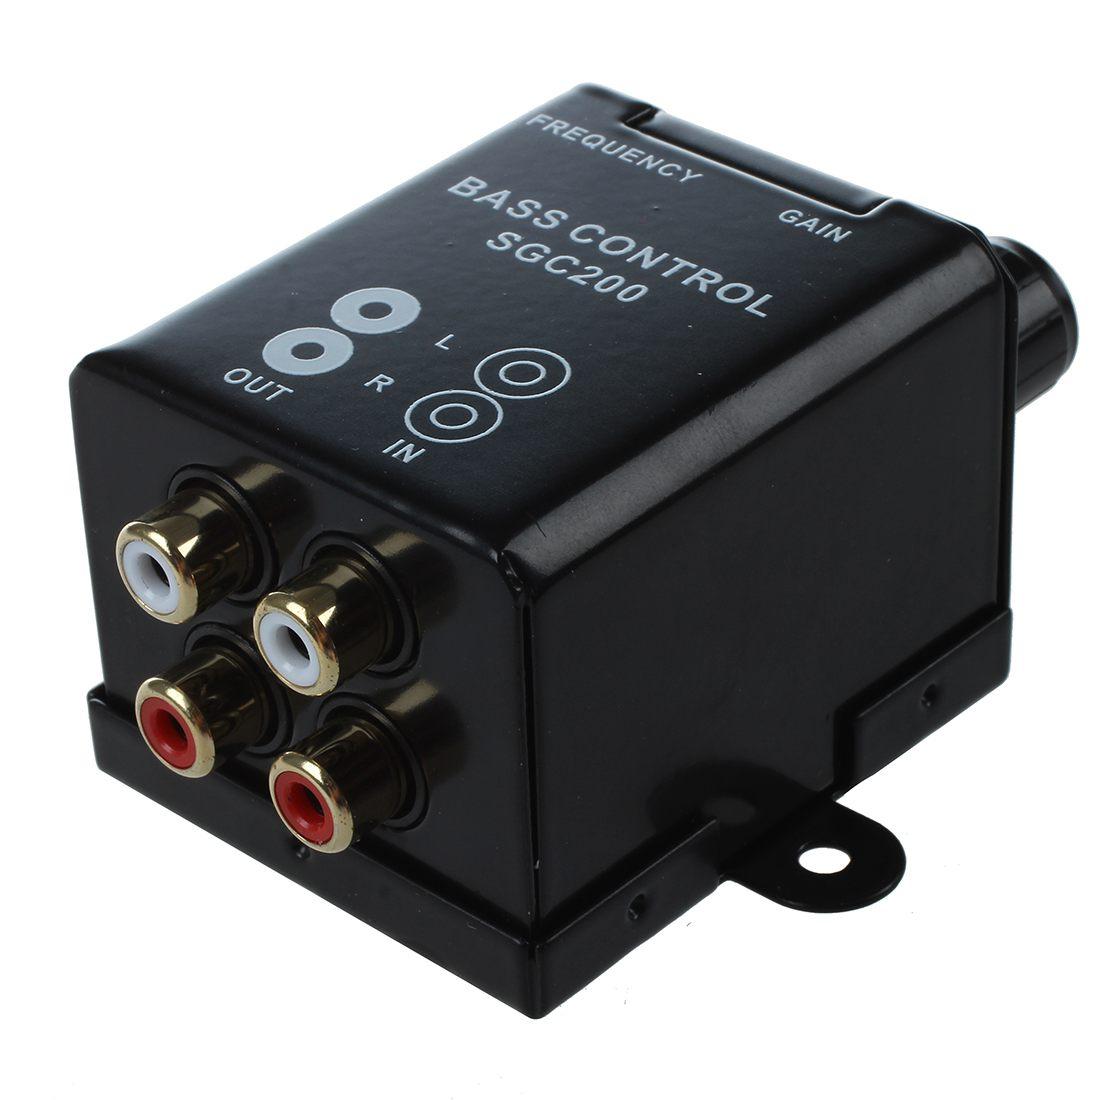 Auto Mini Amplifier 4 Channel Power Amplifier Car Home Hi-Fi Stereo Aud